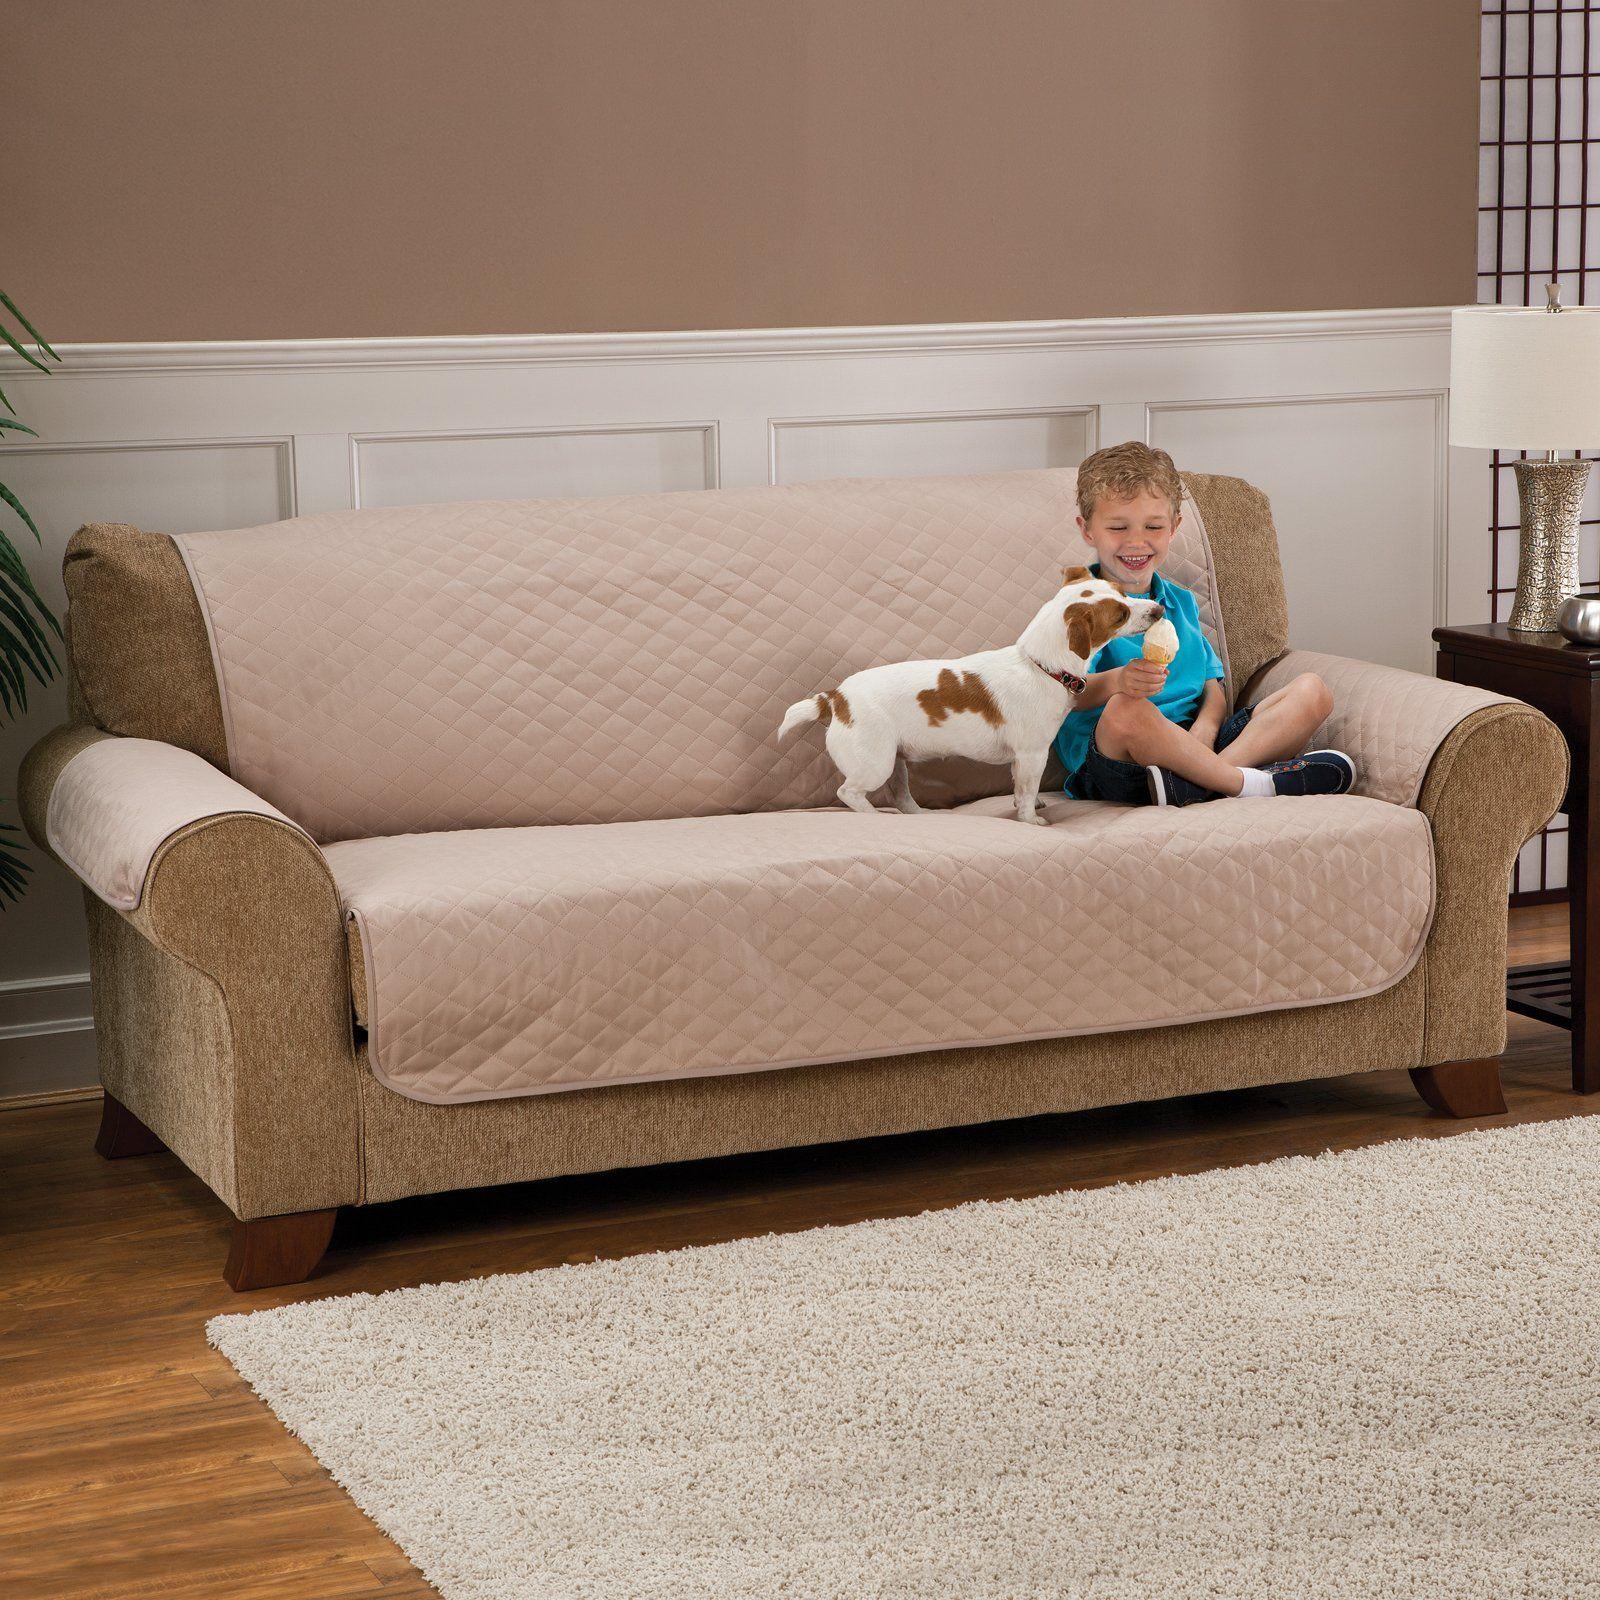 Leather Sofa Madison Water Proof Sofa Pet Protector hayneedle